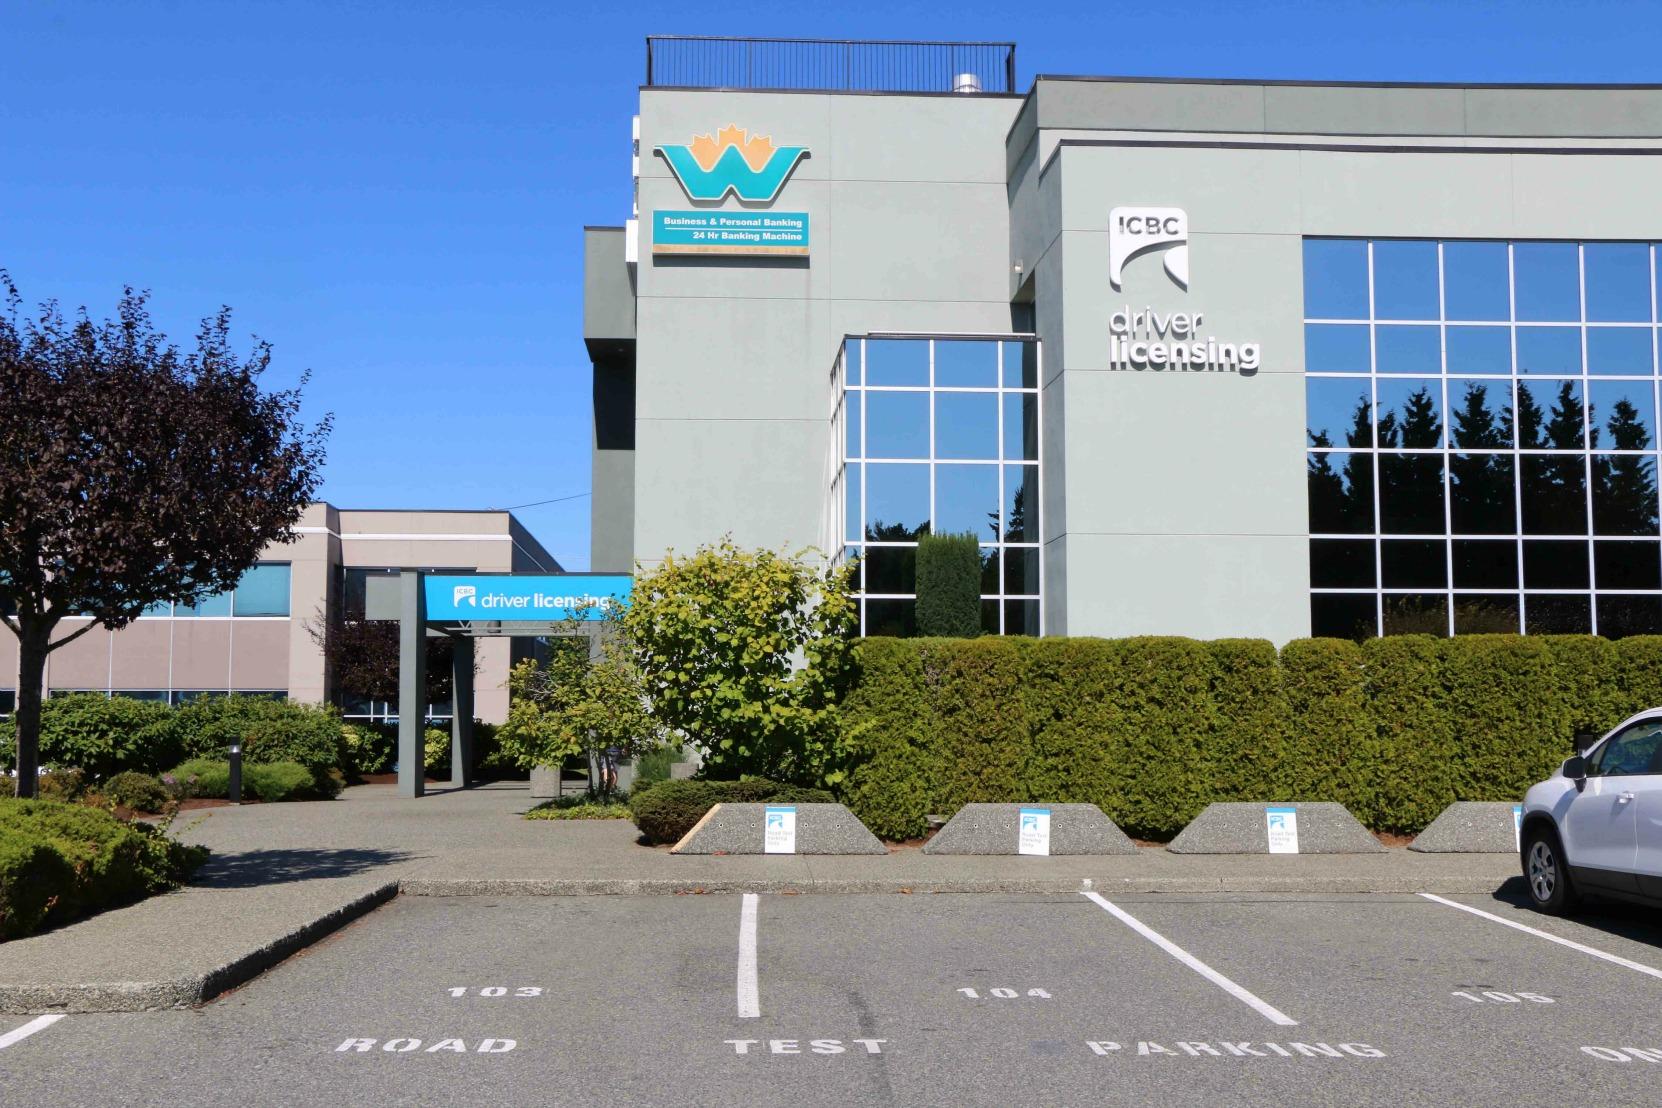 ICBC Driver Licensing office, 6475 Metral Drive, Nanaimo, B.C. (photo by WestCoastDriver Training.com)